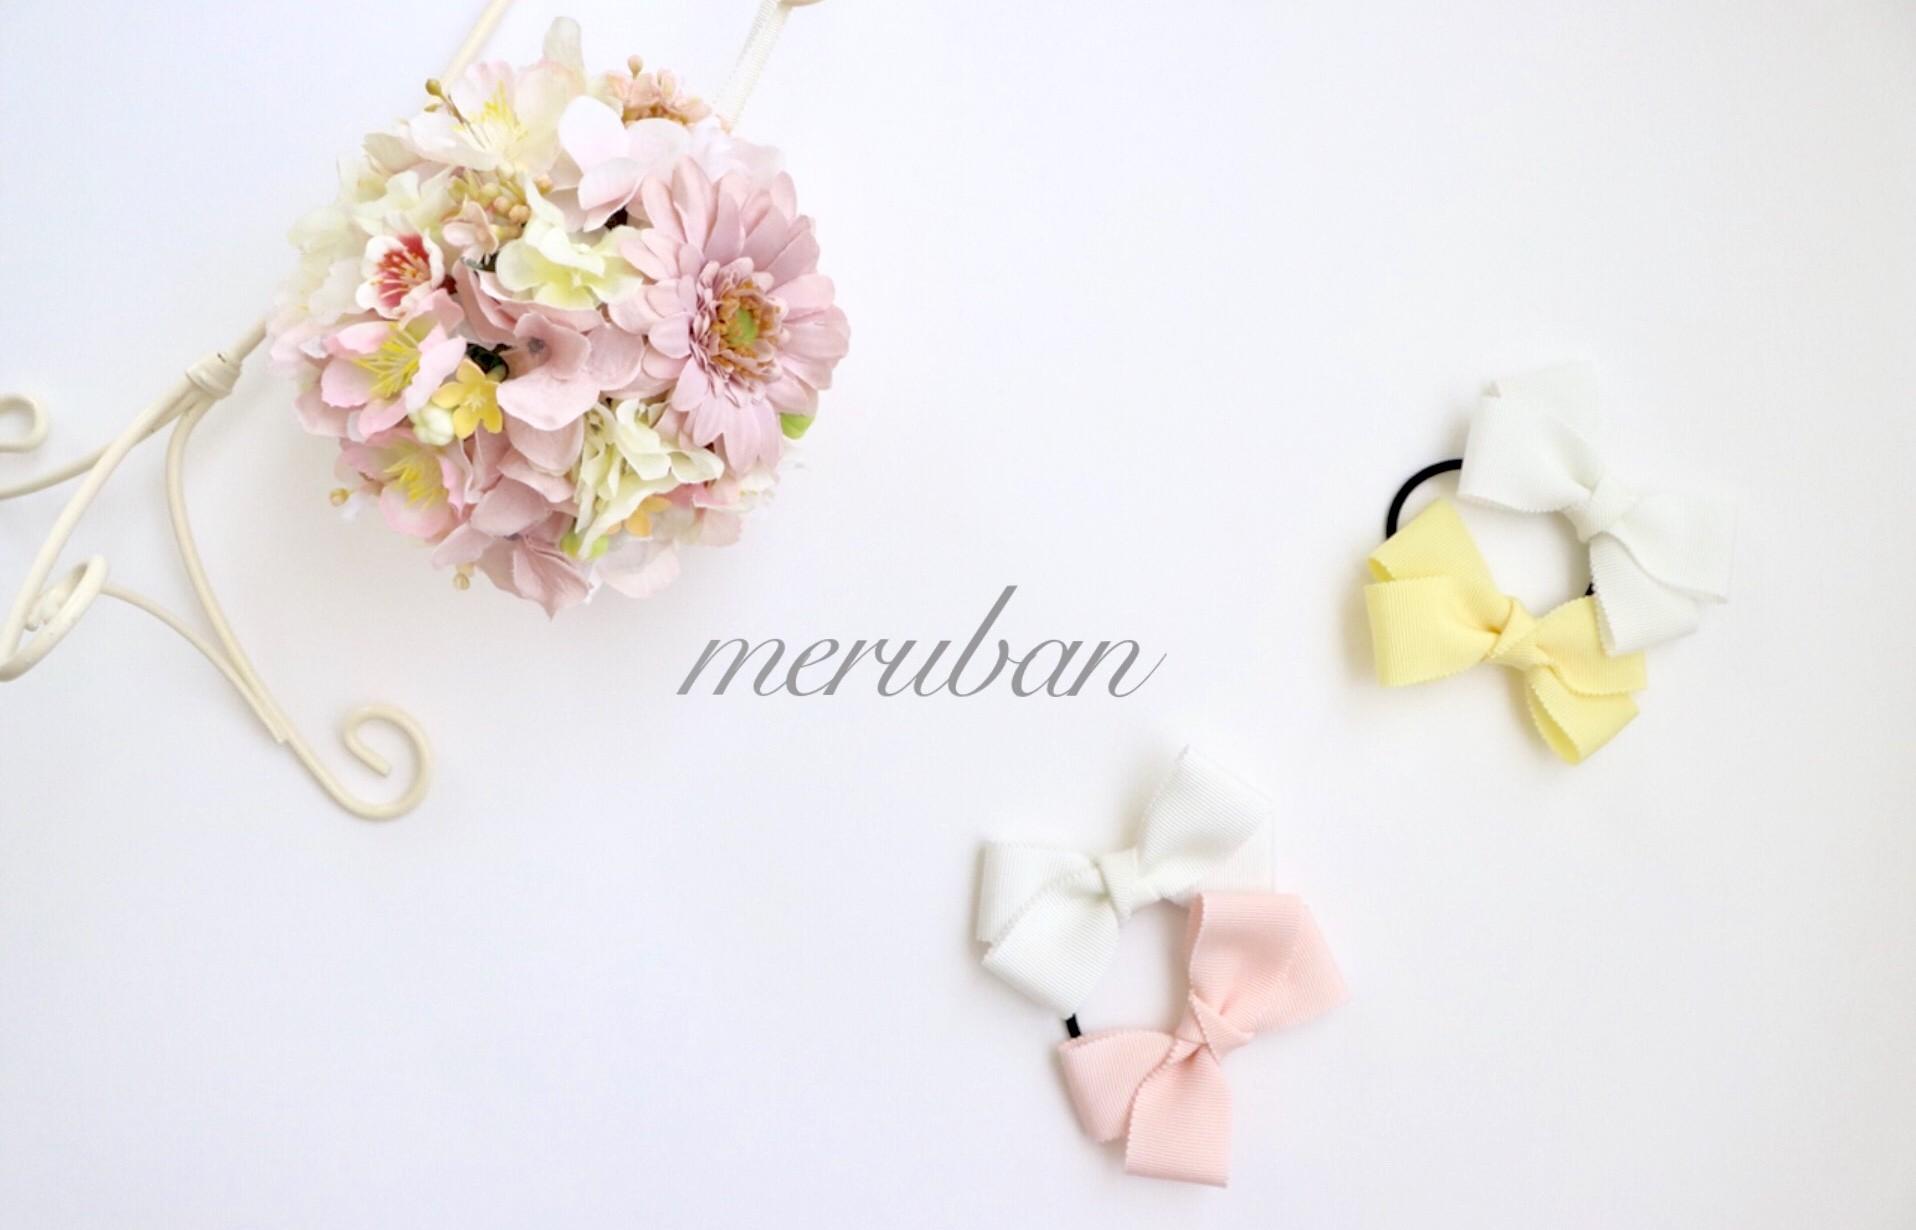 ⋈ meruban ⋈